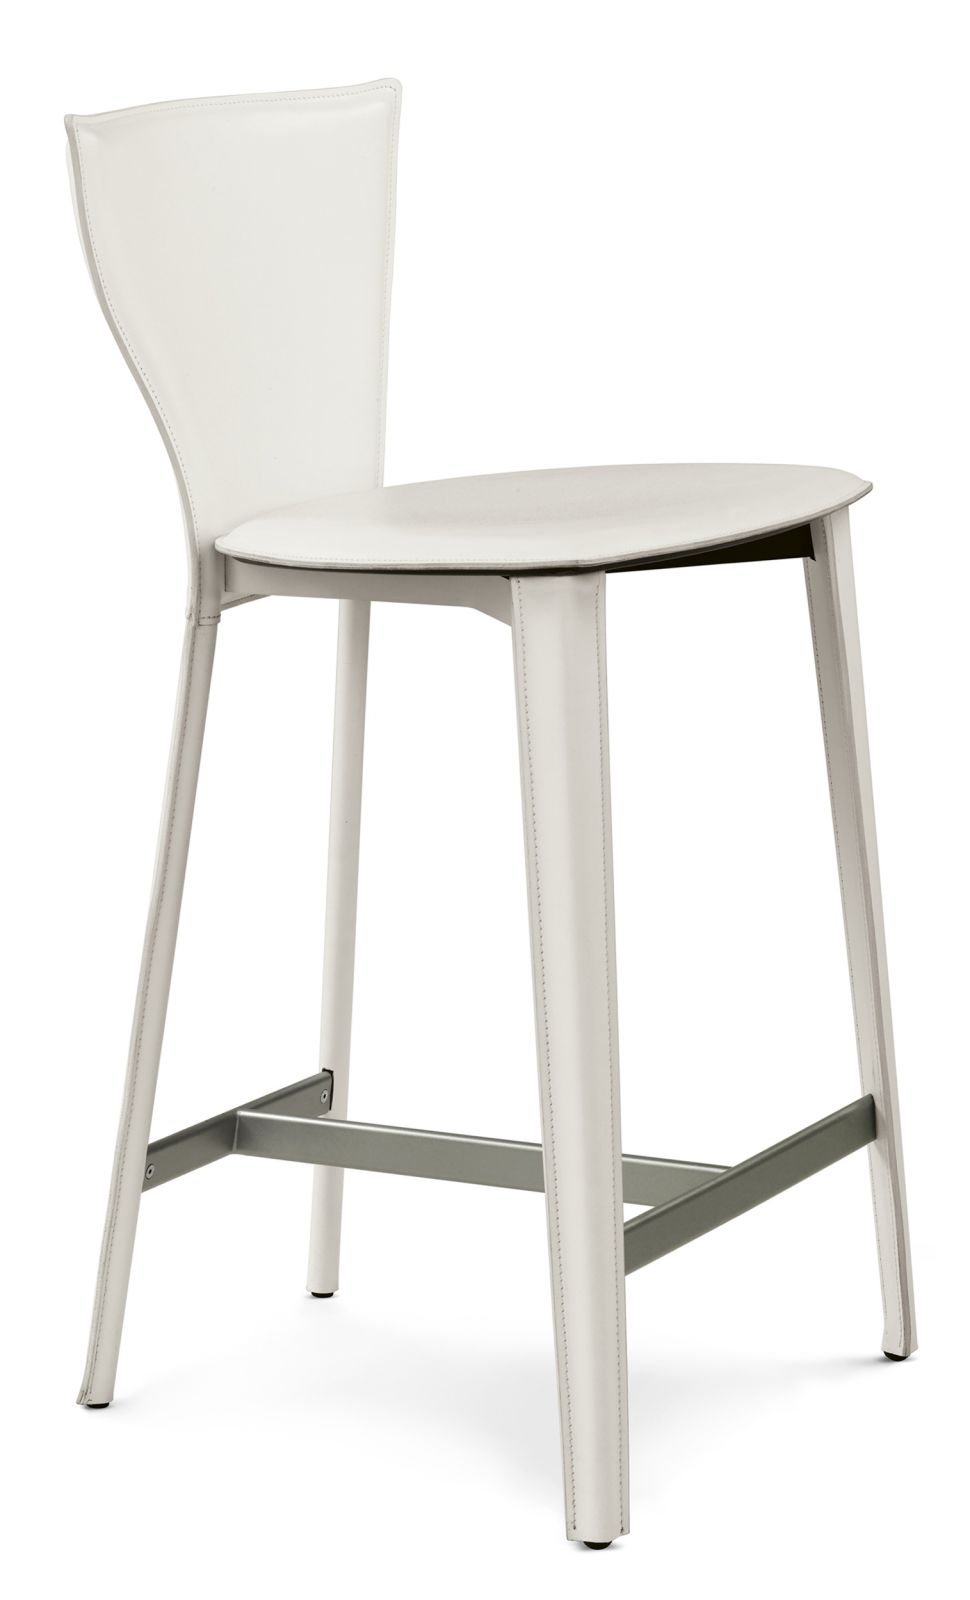 modern-bar-stools-Italian-furniture-large (24).jpg